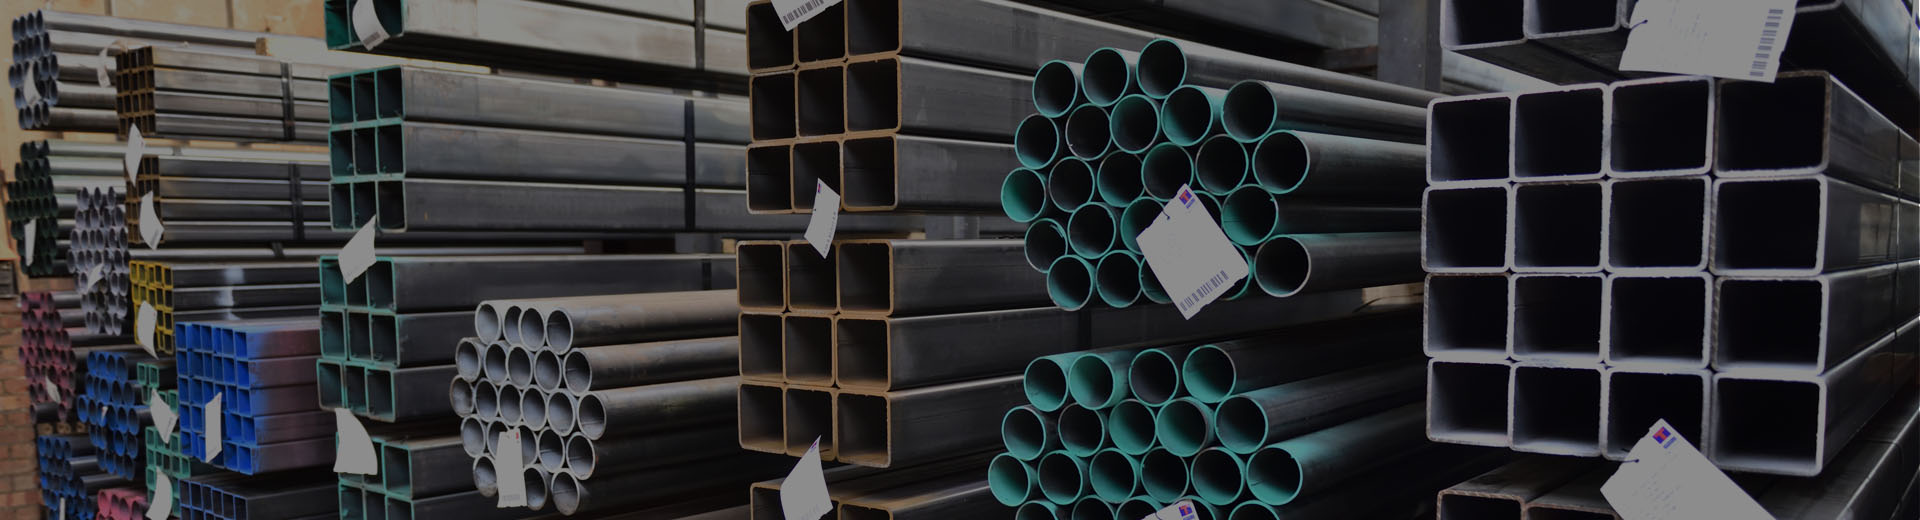 ERW Rectangular Steel Tubes